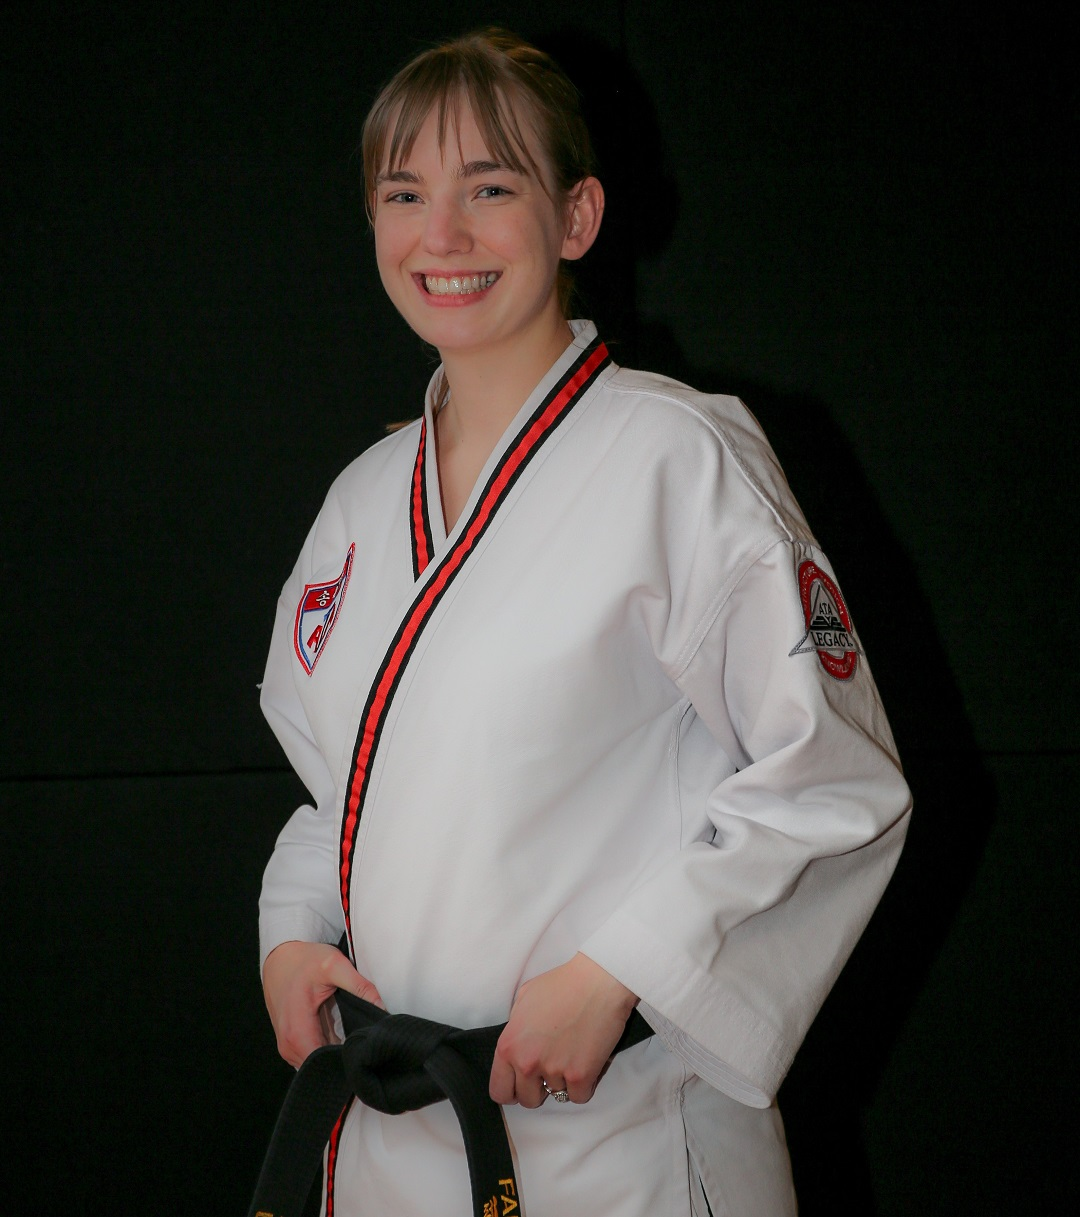 Faith, Summit Martial Arts in Mason City, IA